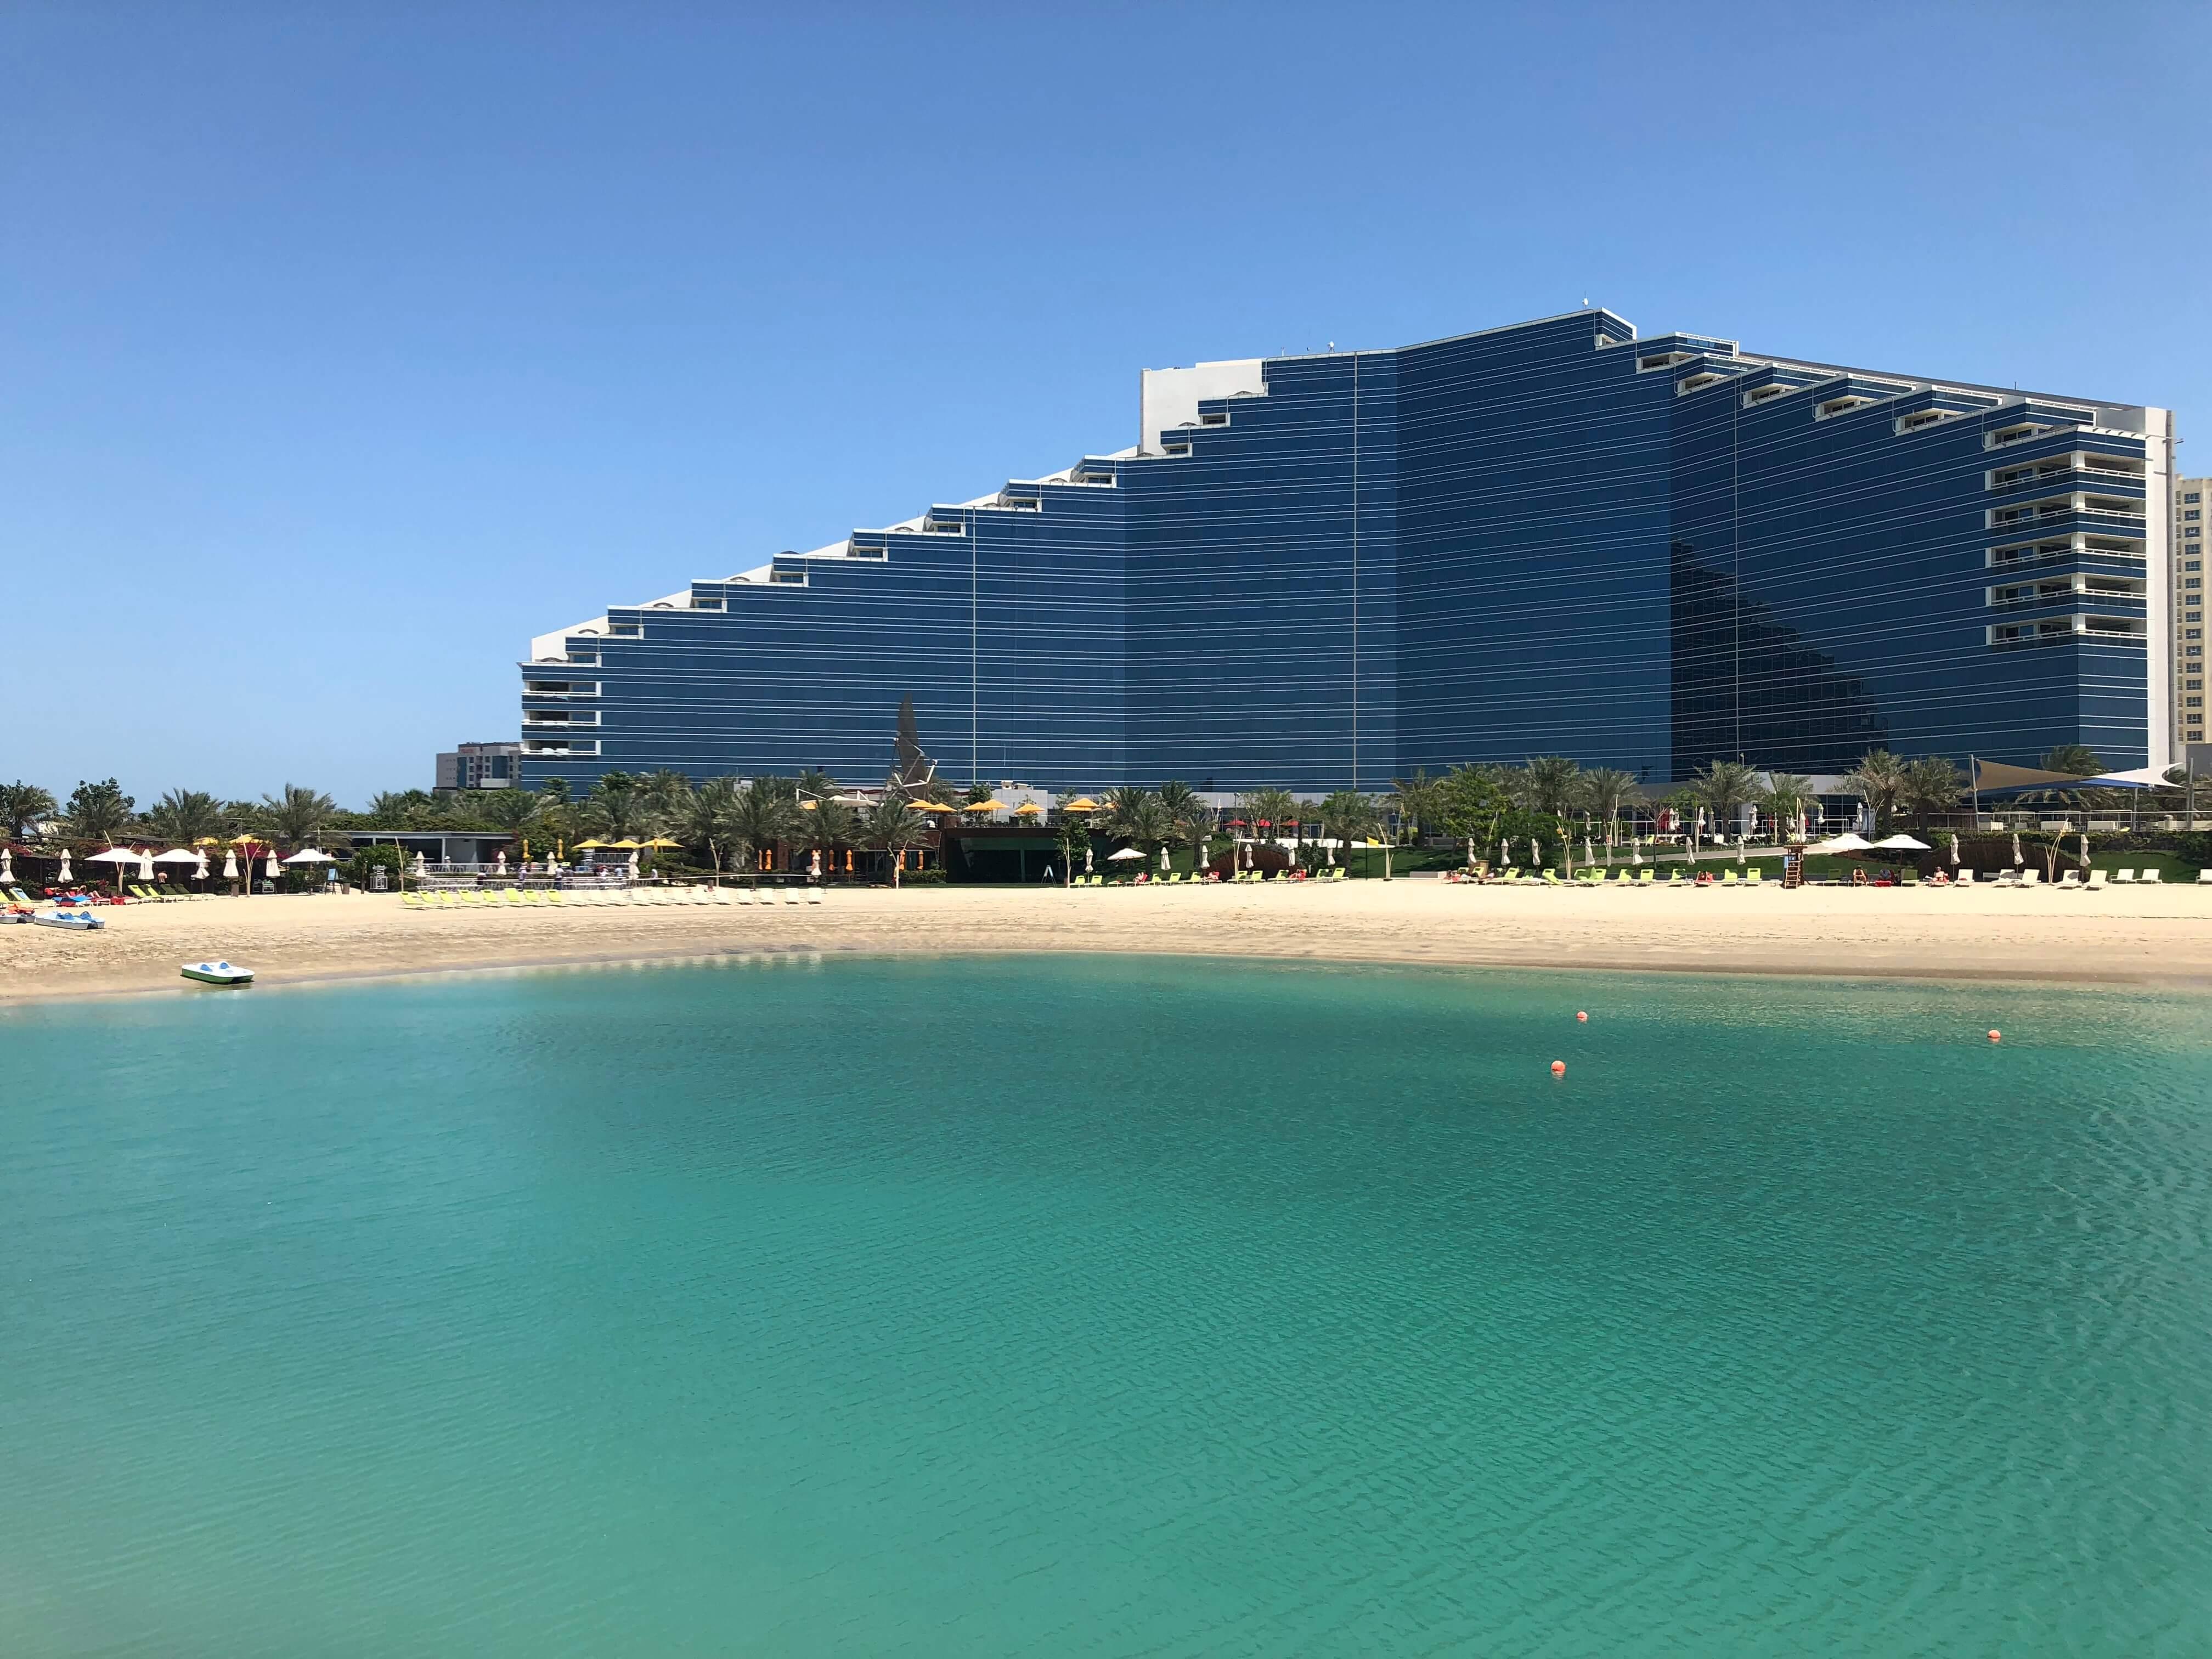 The Art Hotel & Resort